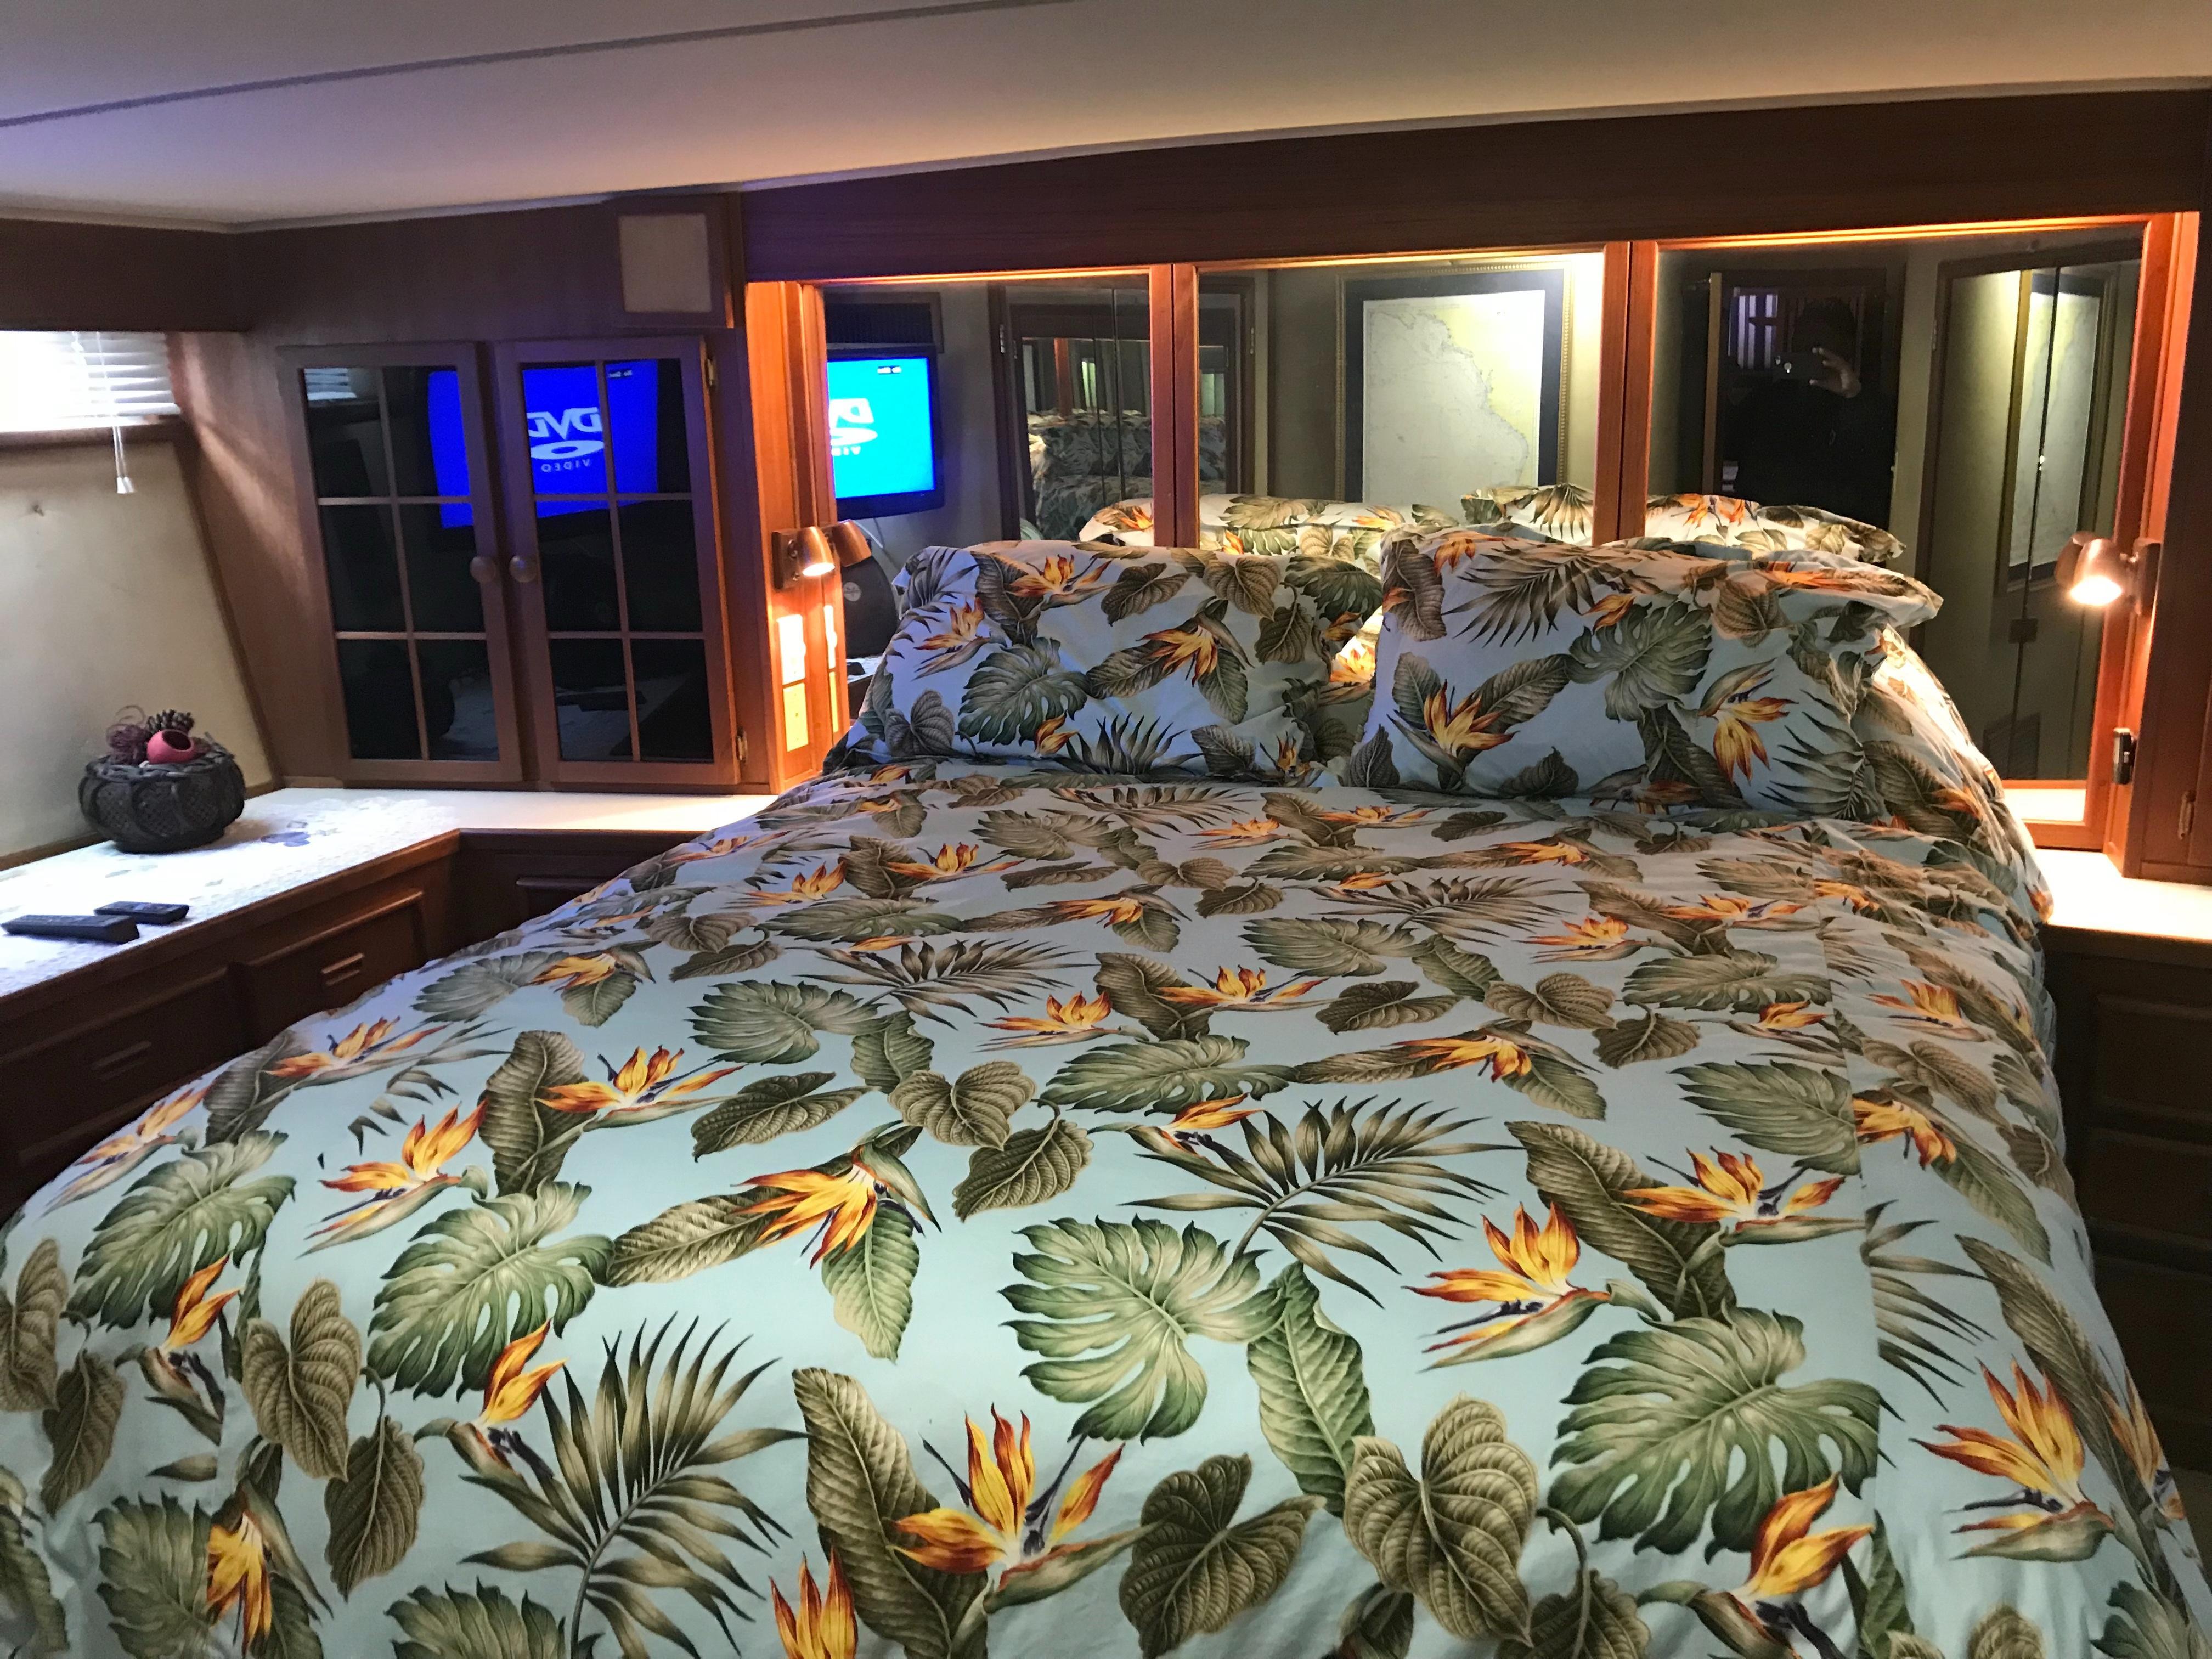 Chris-craft 46 Constellation - Island Queen Berth in Master Stateroom